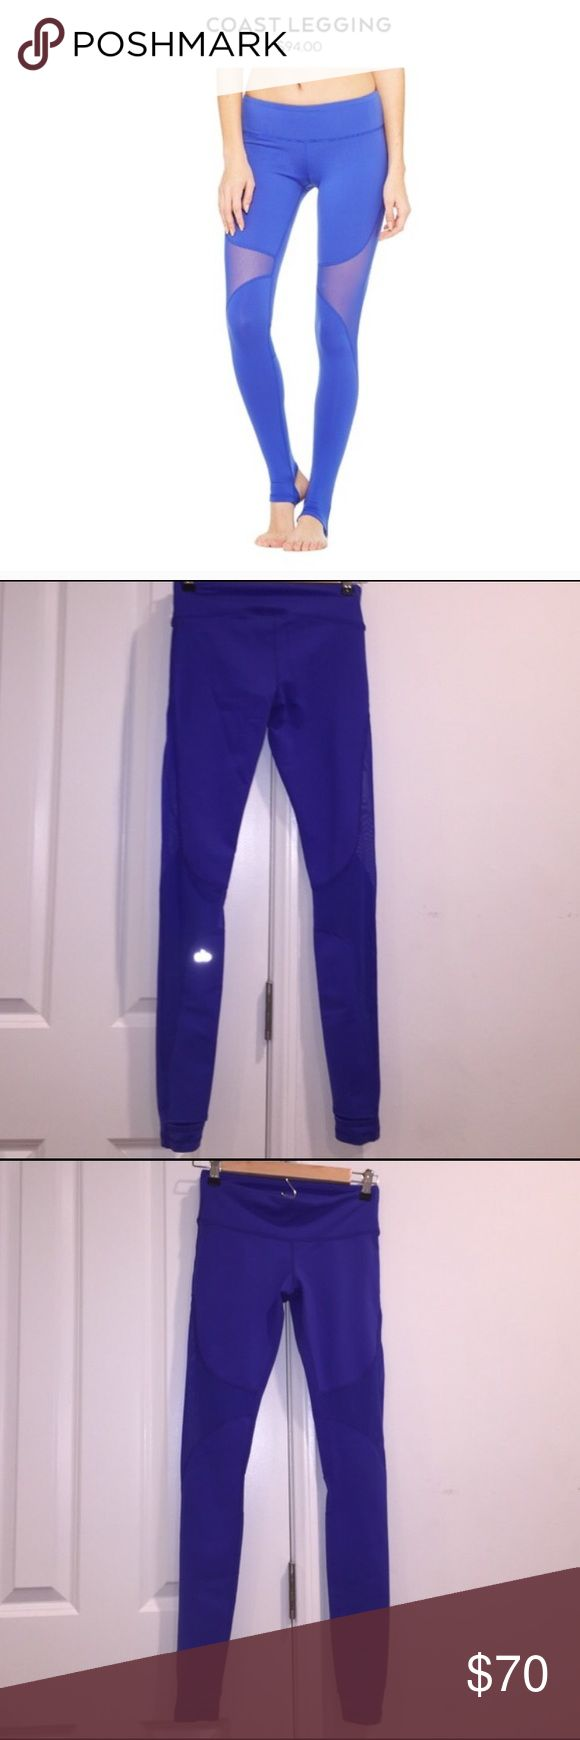 Alo Coast Leggings Blue Selling Alo stirrup leggings. This color is sold out online! ALO Yoga Pants Leggings